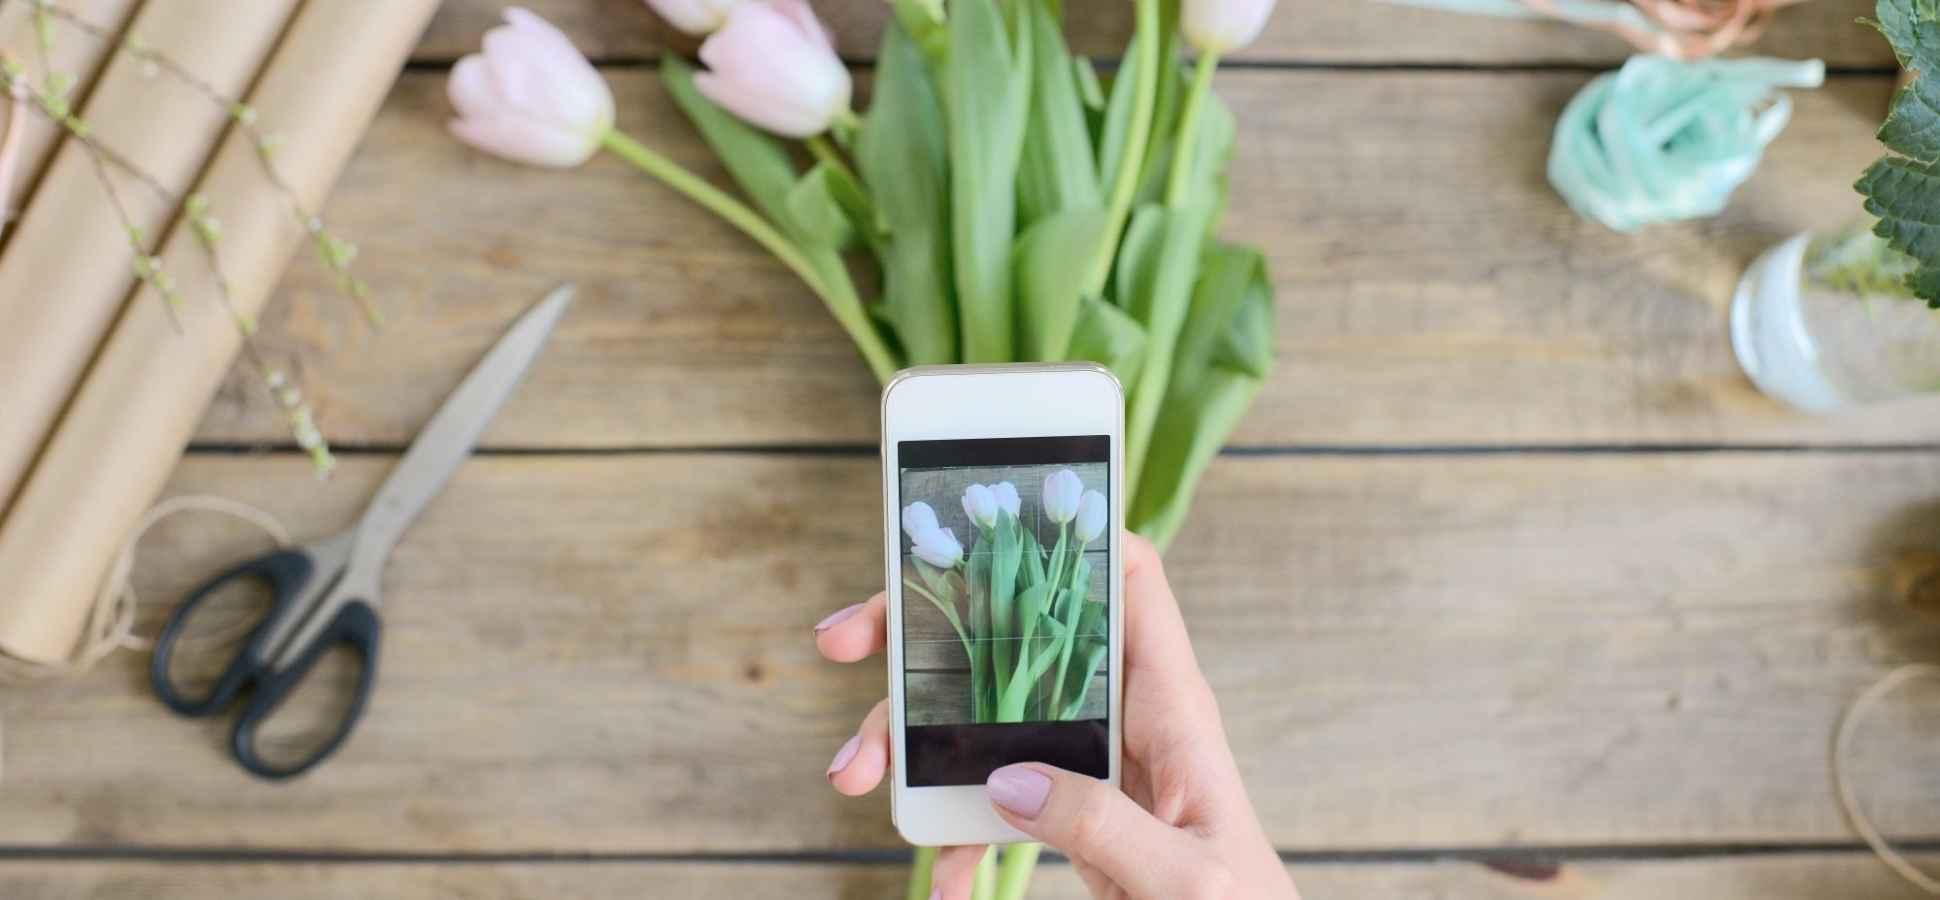 5 Ways the Smartest Businesses Use Instagram Marketing